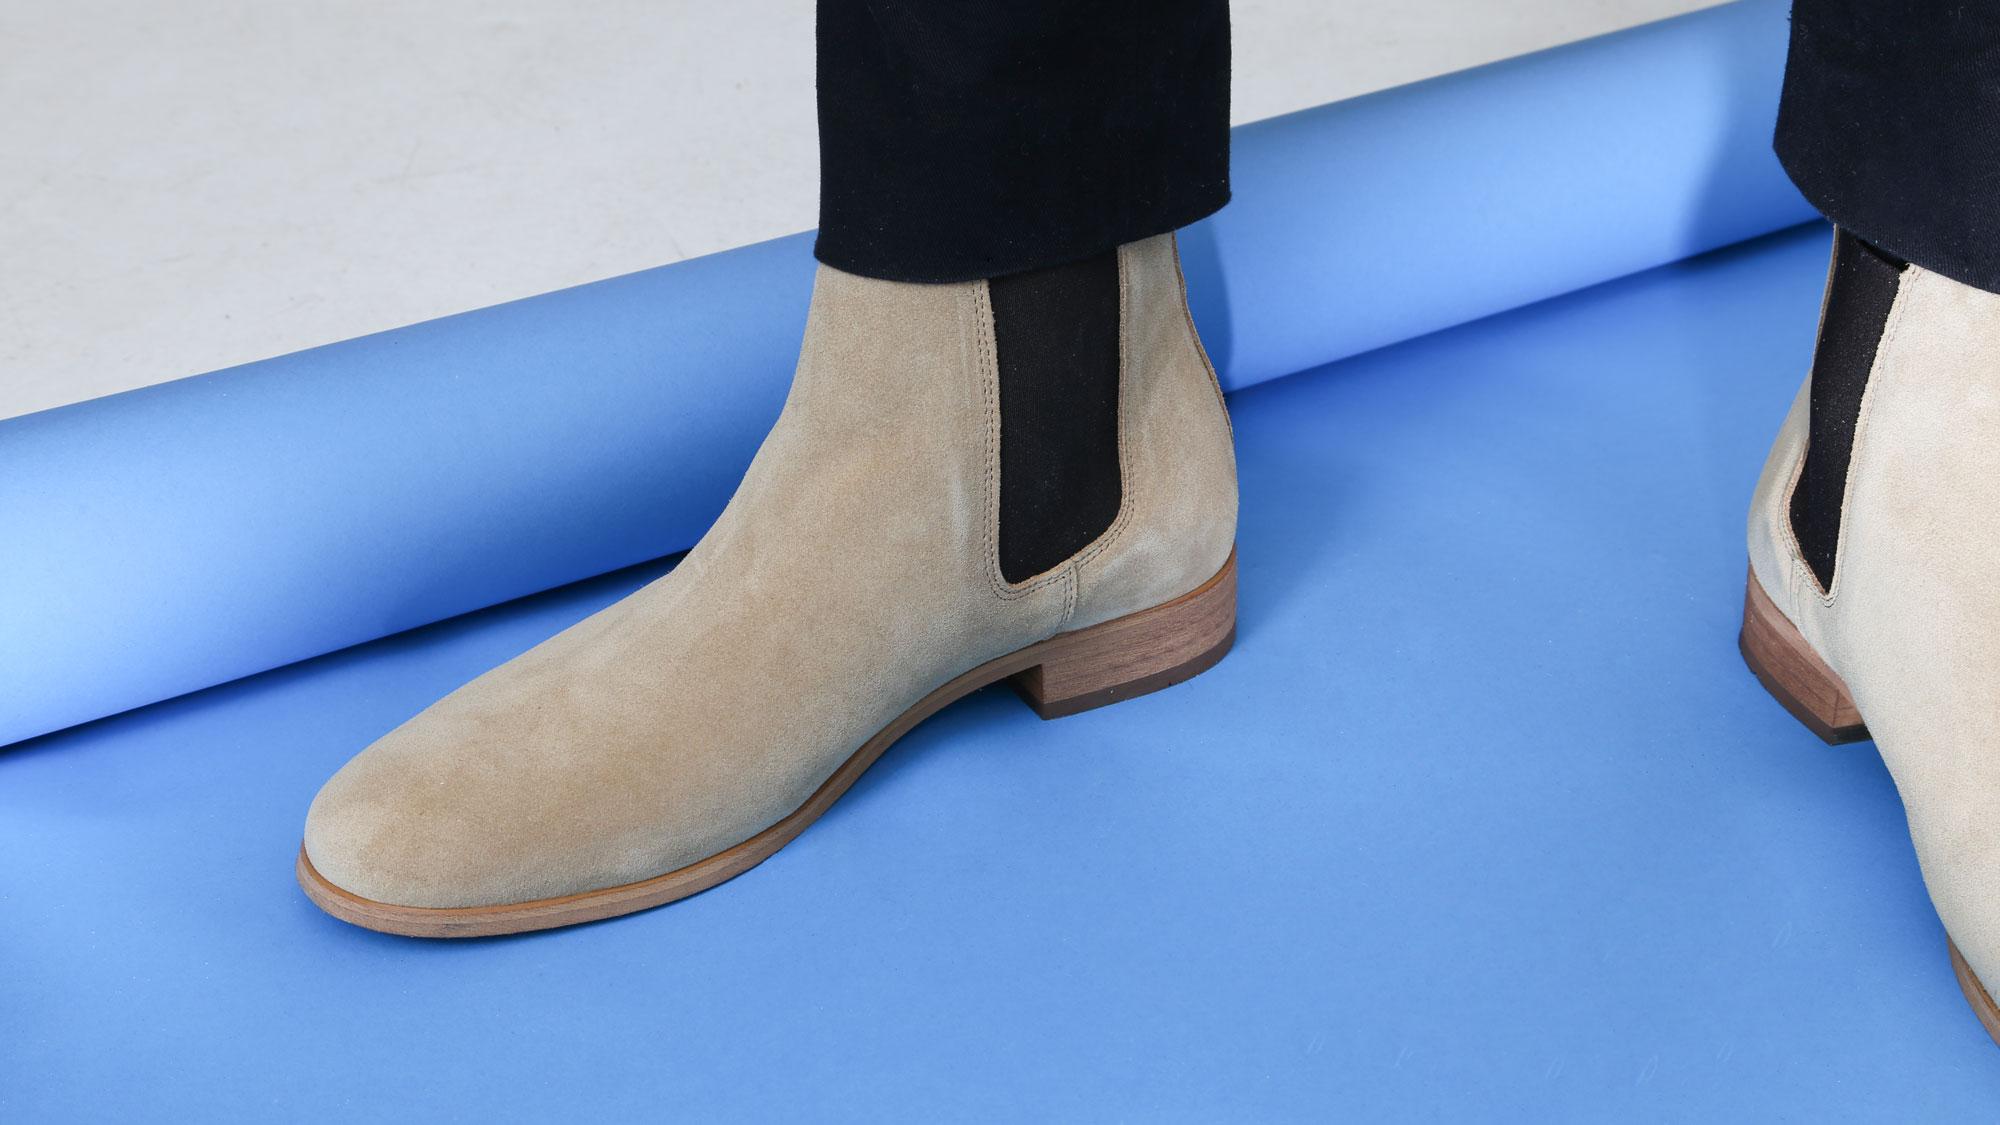 cb3599534fc4 Find Dine Chelsea Støvler Frem